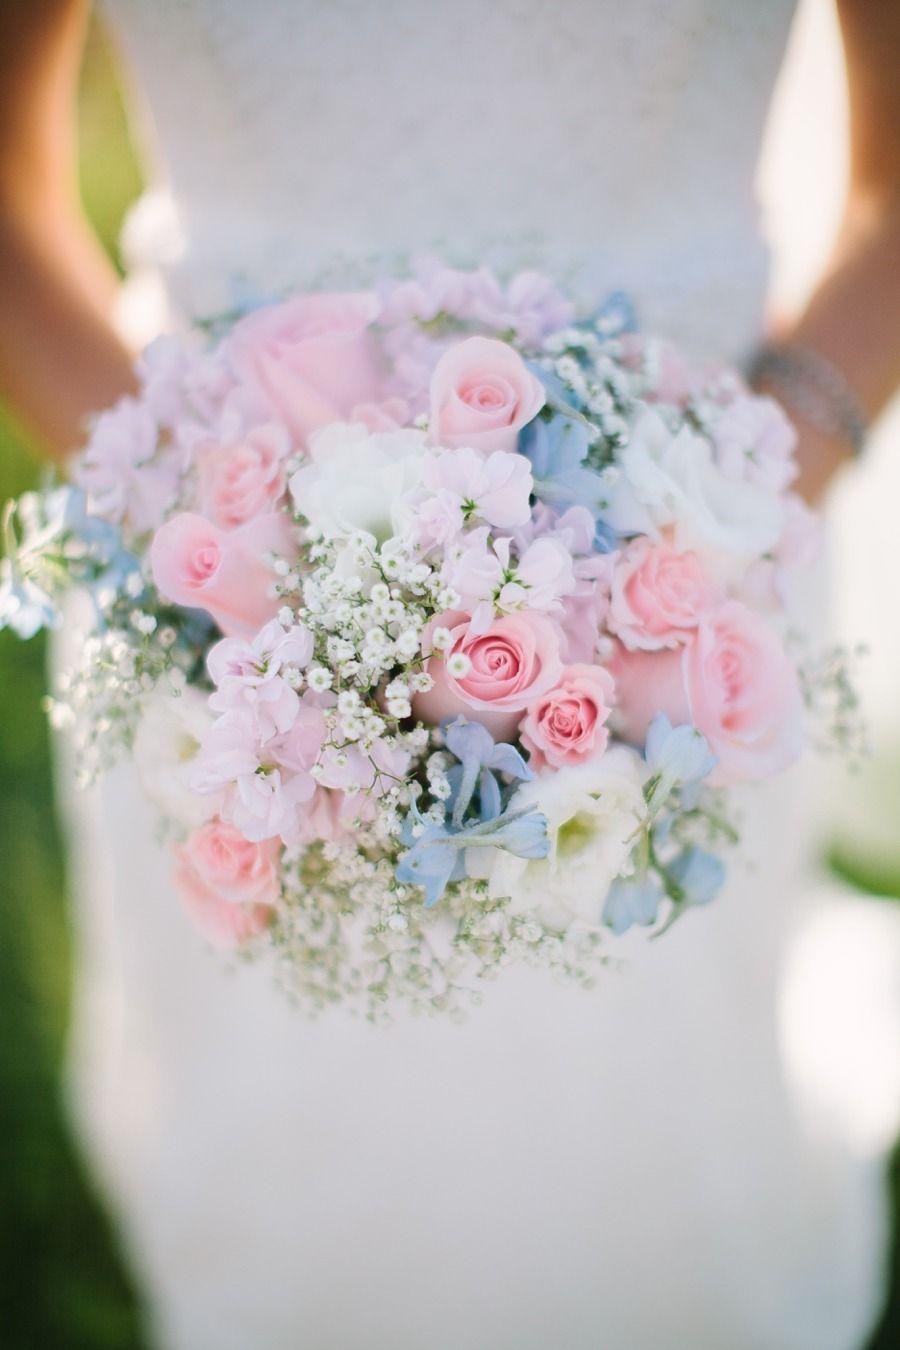 Pastel southern vineyard wedding 51113 pinterest bouquet planning the perfect wedding flowers on a budget wedding planning tip 25 mightylinksfo